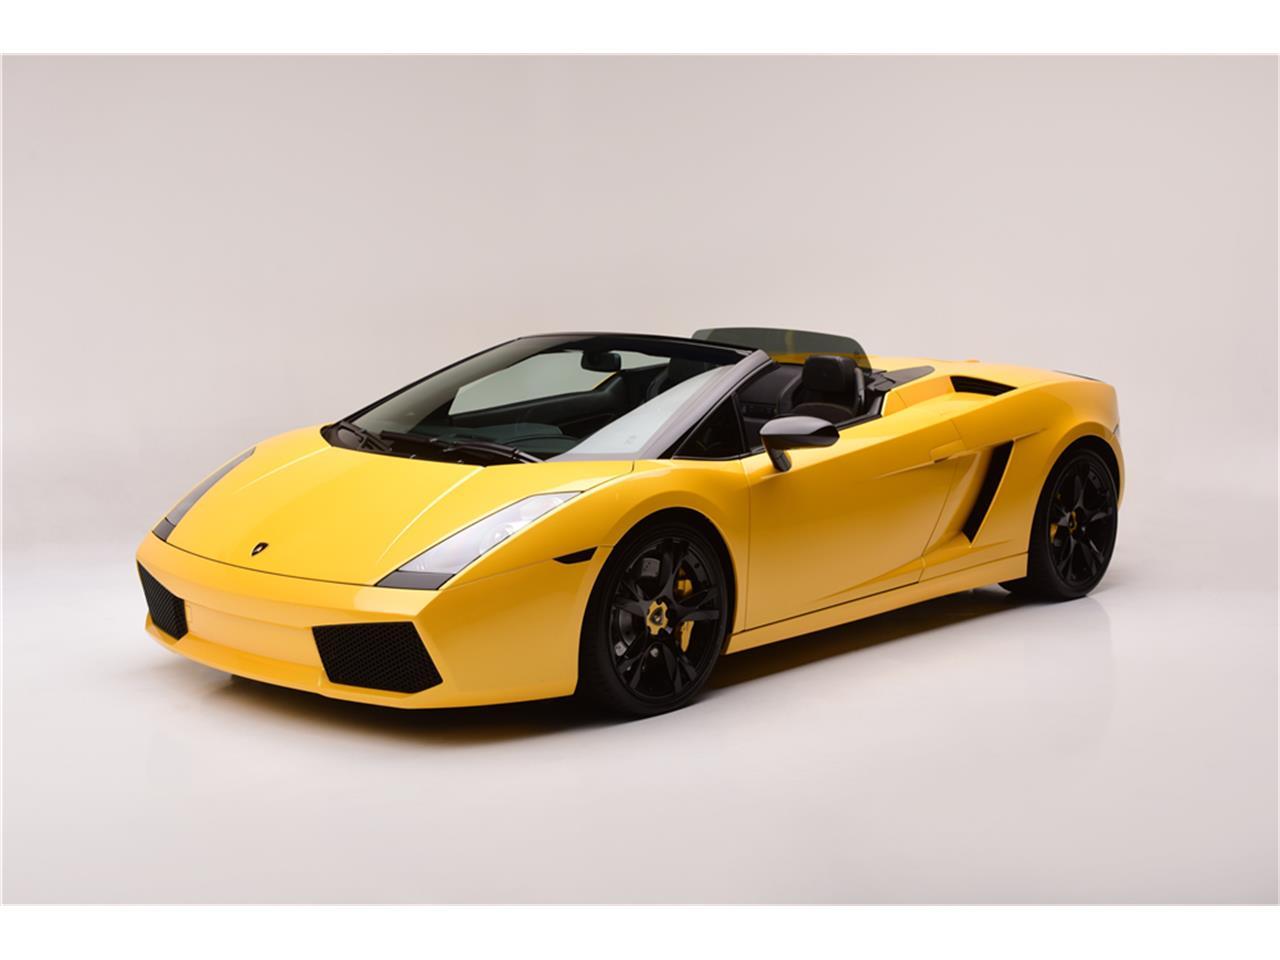 2007 Lamborghini Gallardo For Sale Classiccars Com Cc 1021693